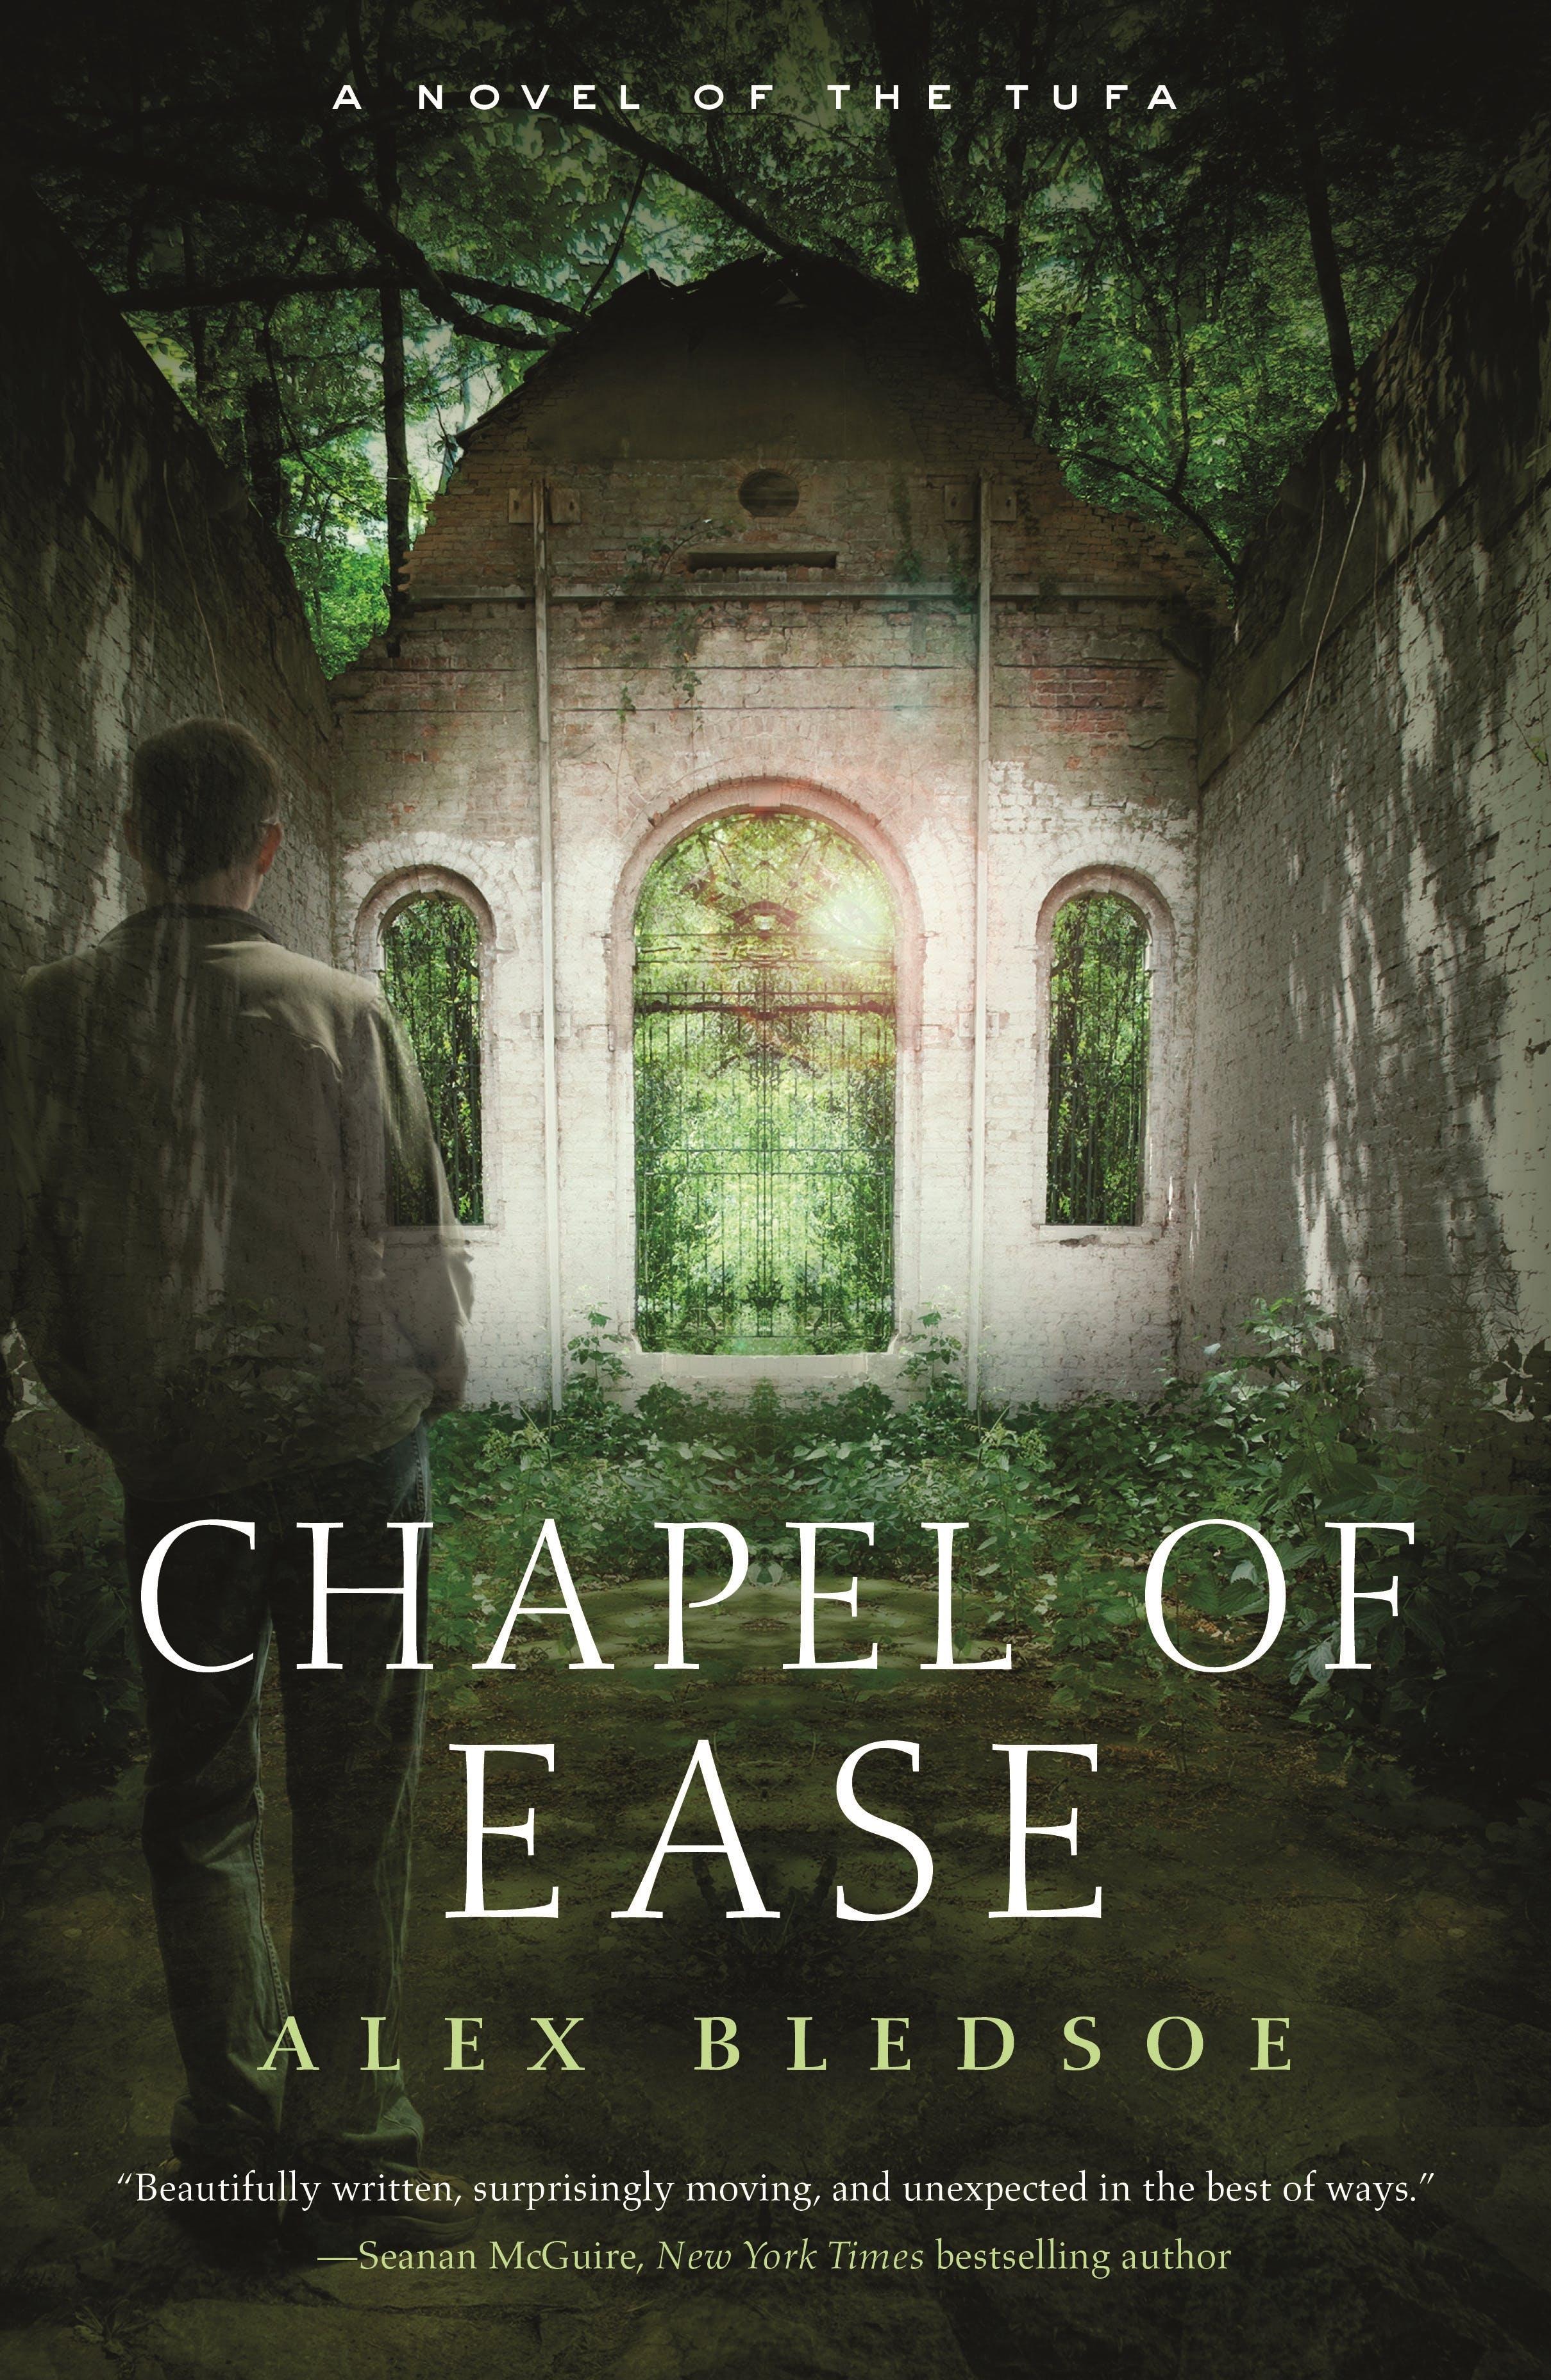 Image of Chapel of Ease